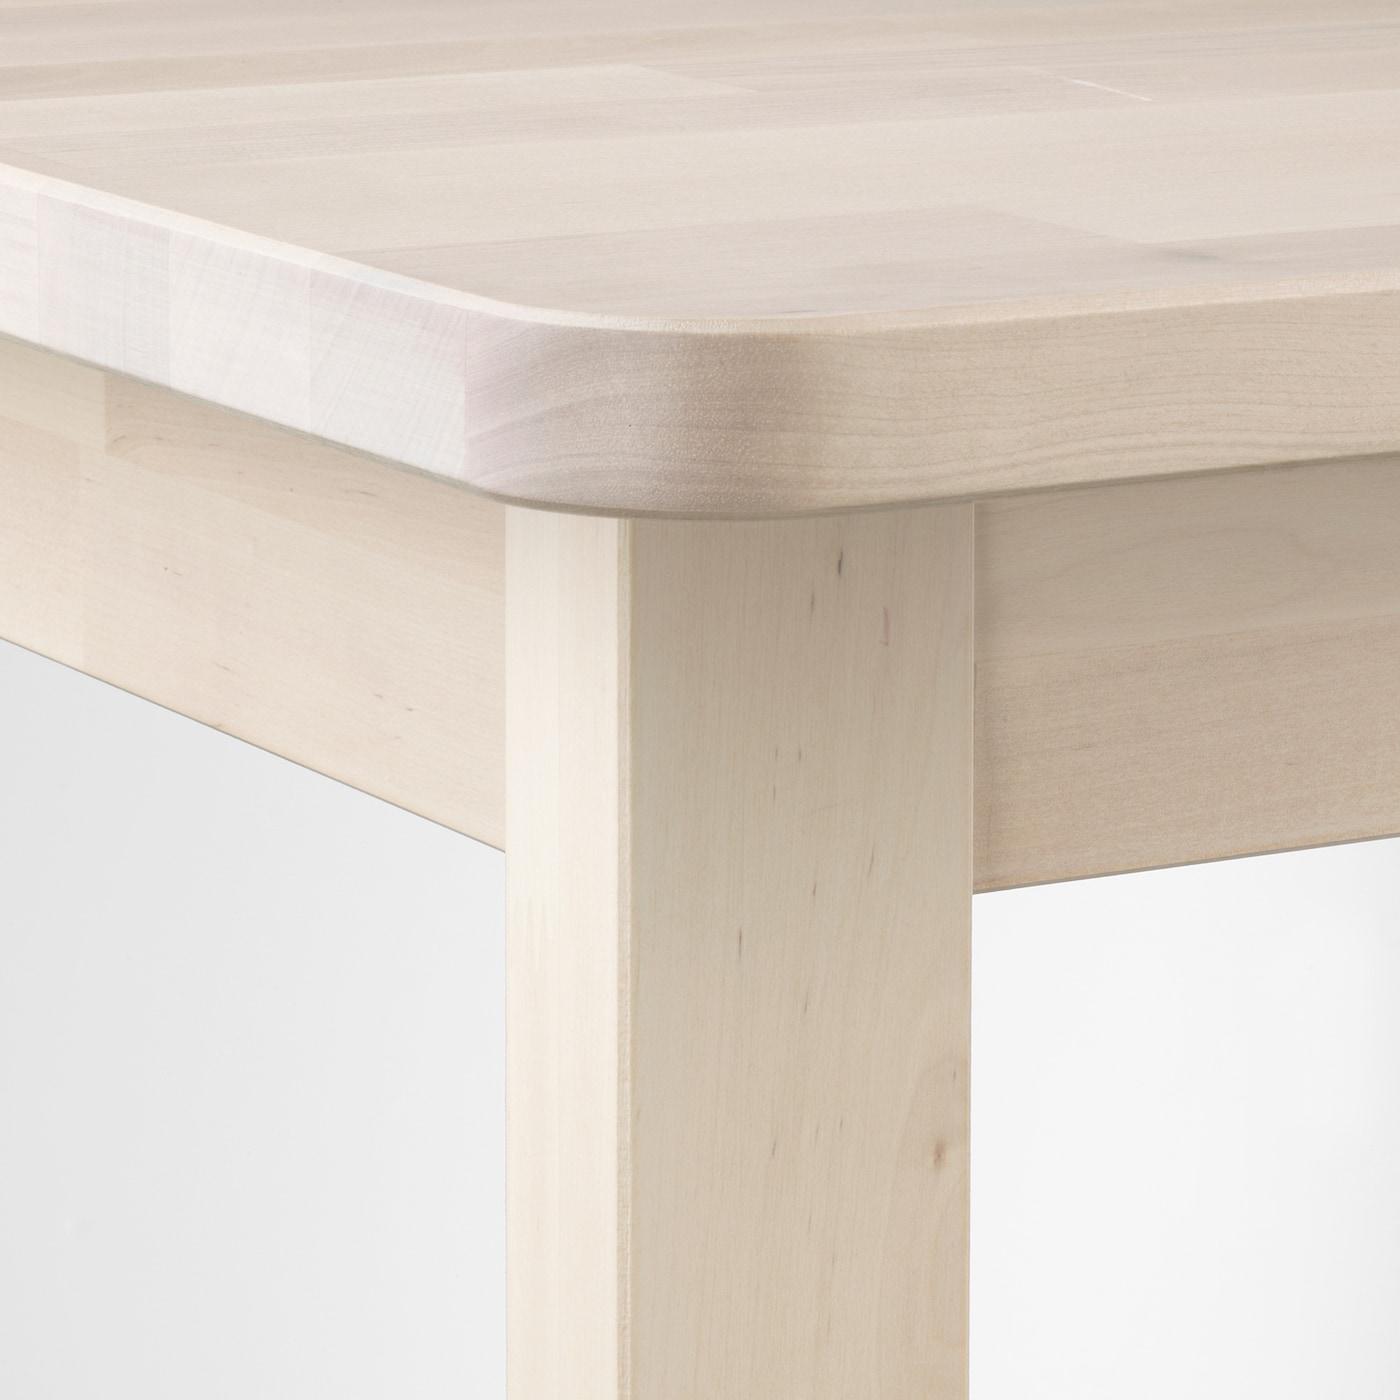 Norraker Bar Table Birch 29 1 8x29 1 8 Ikea